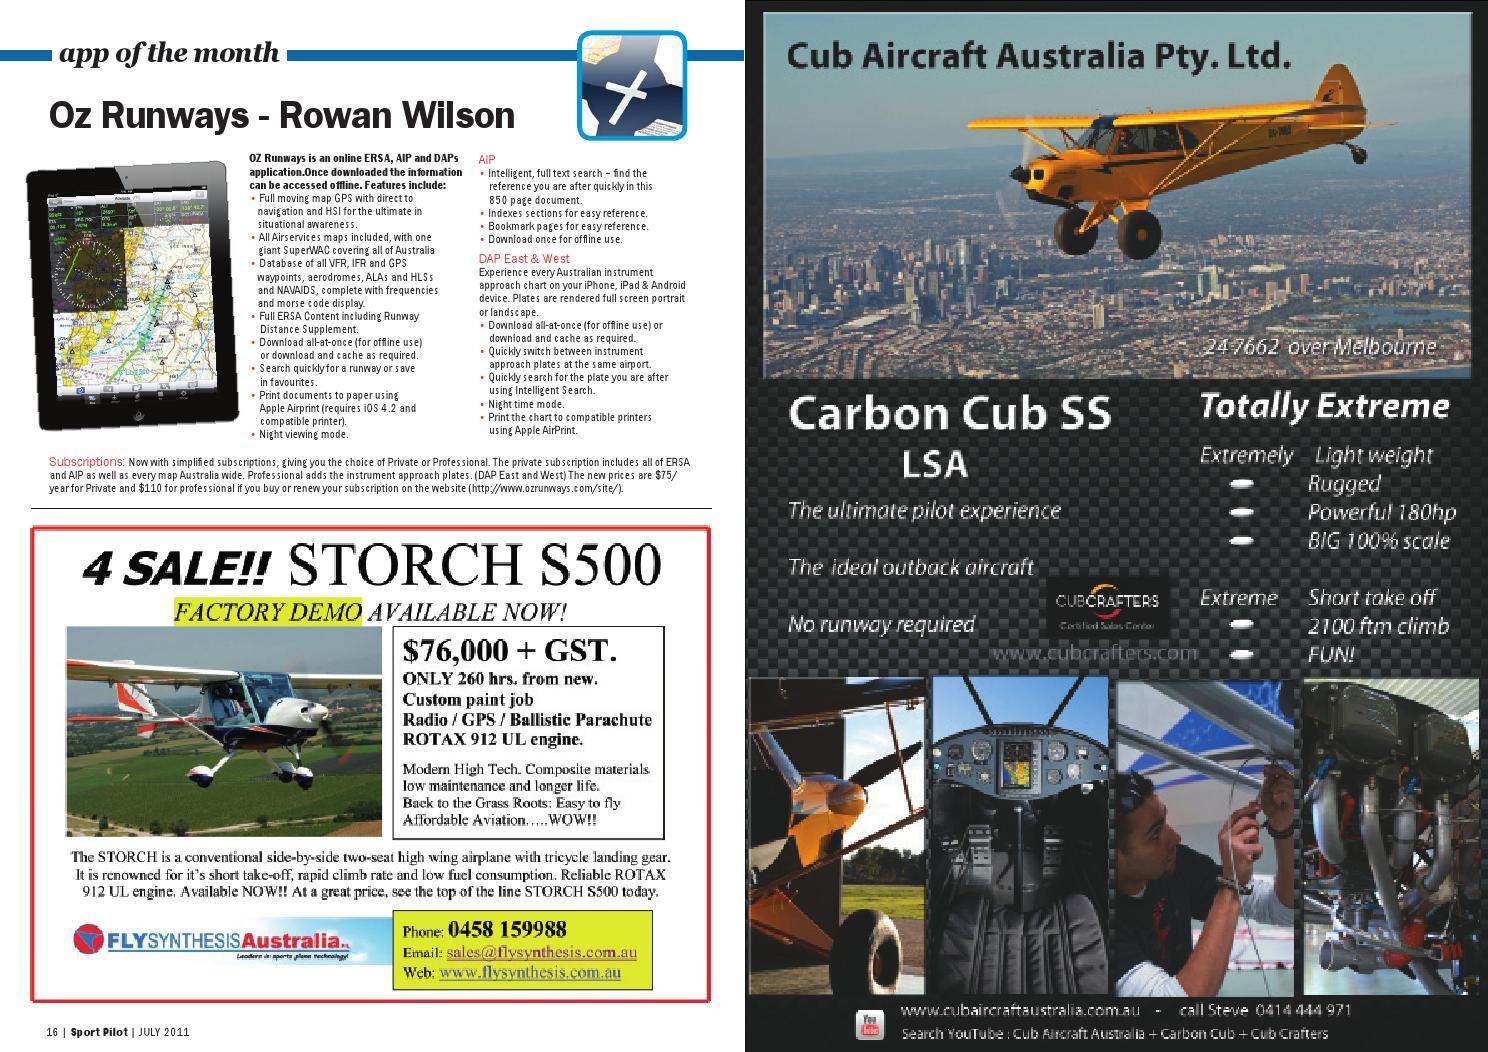 Sport pilot 2 jul 2011 by Recreational Aviation Australia - issuu